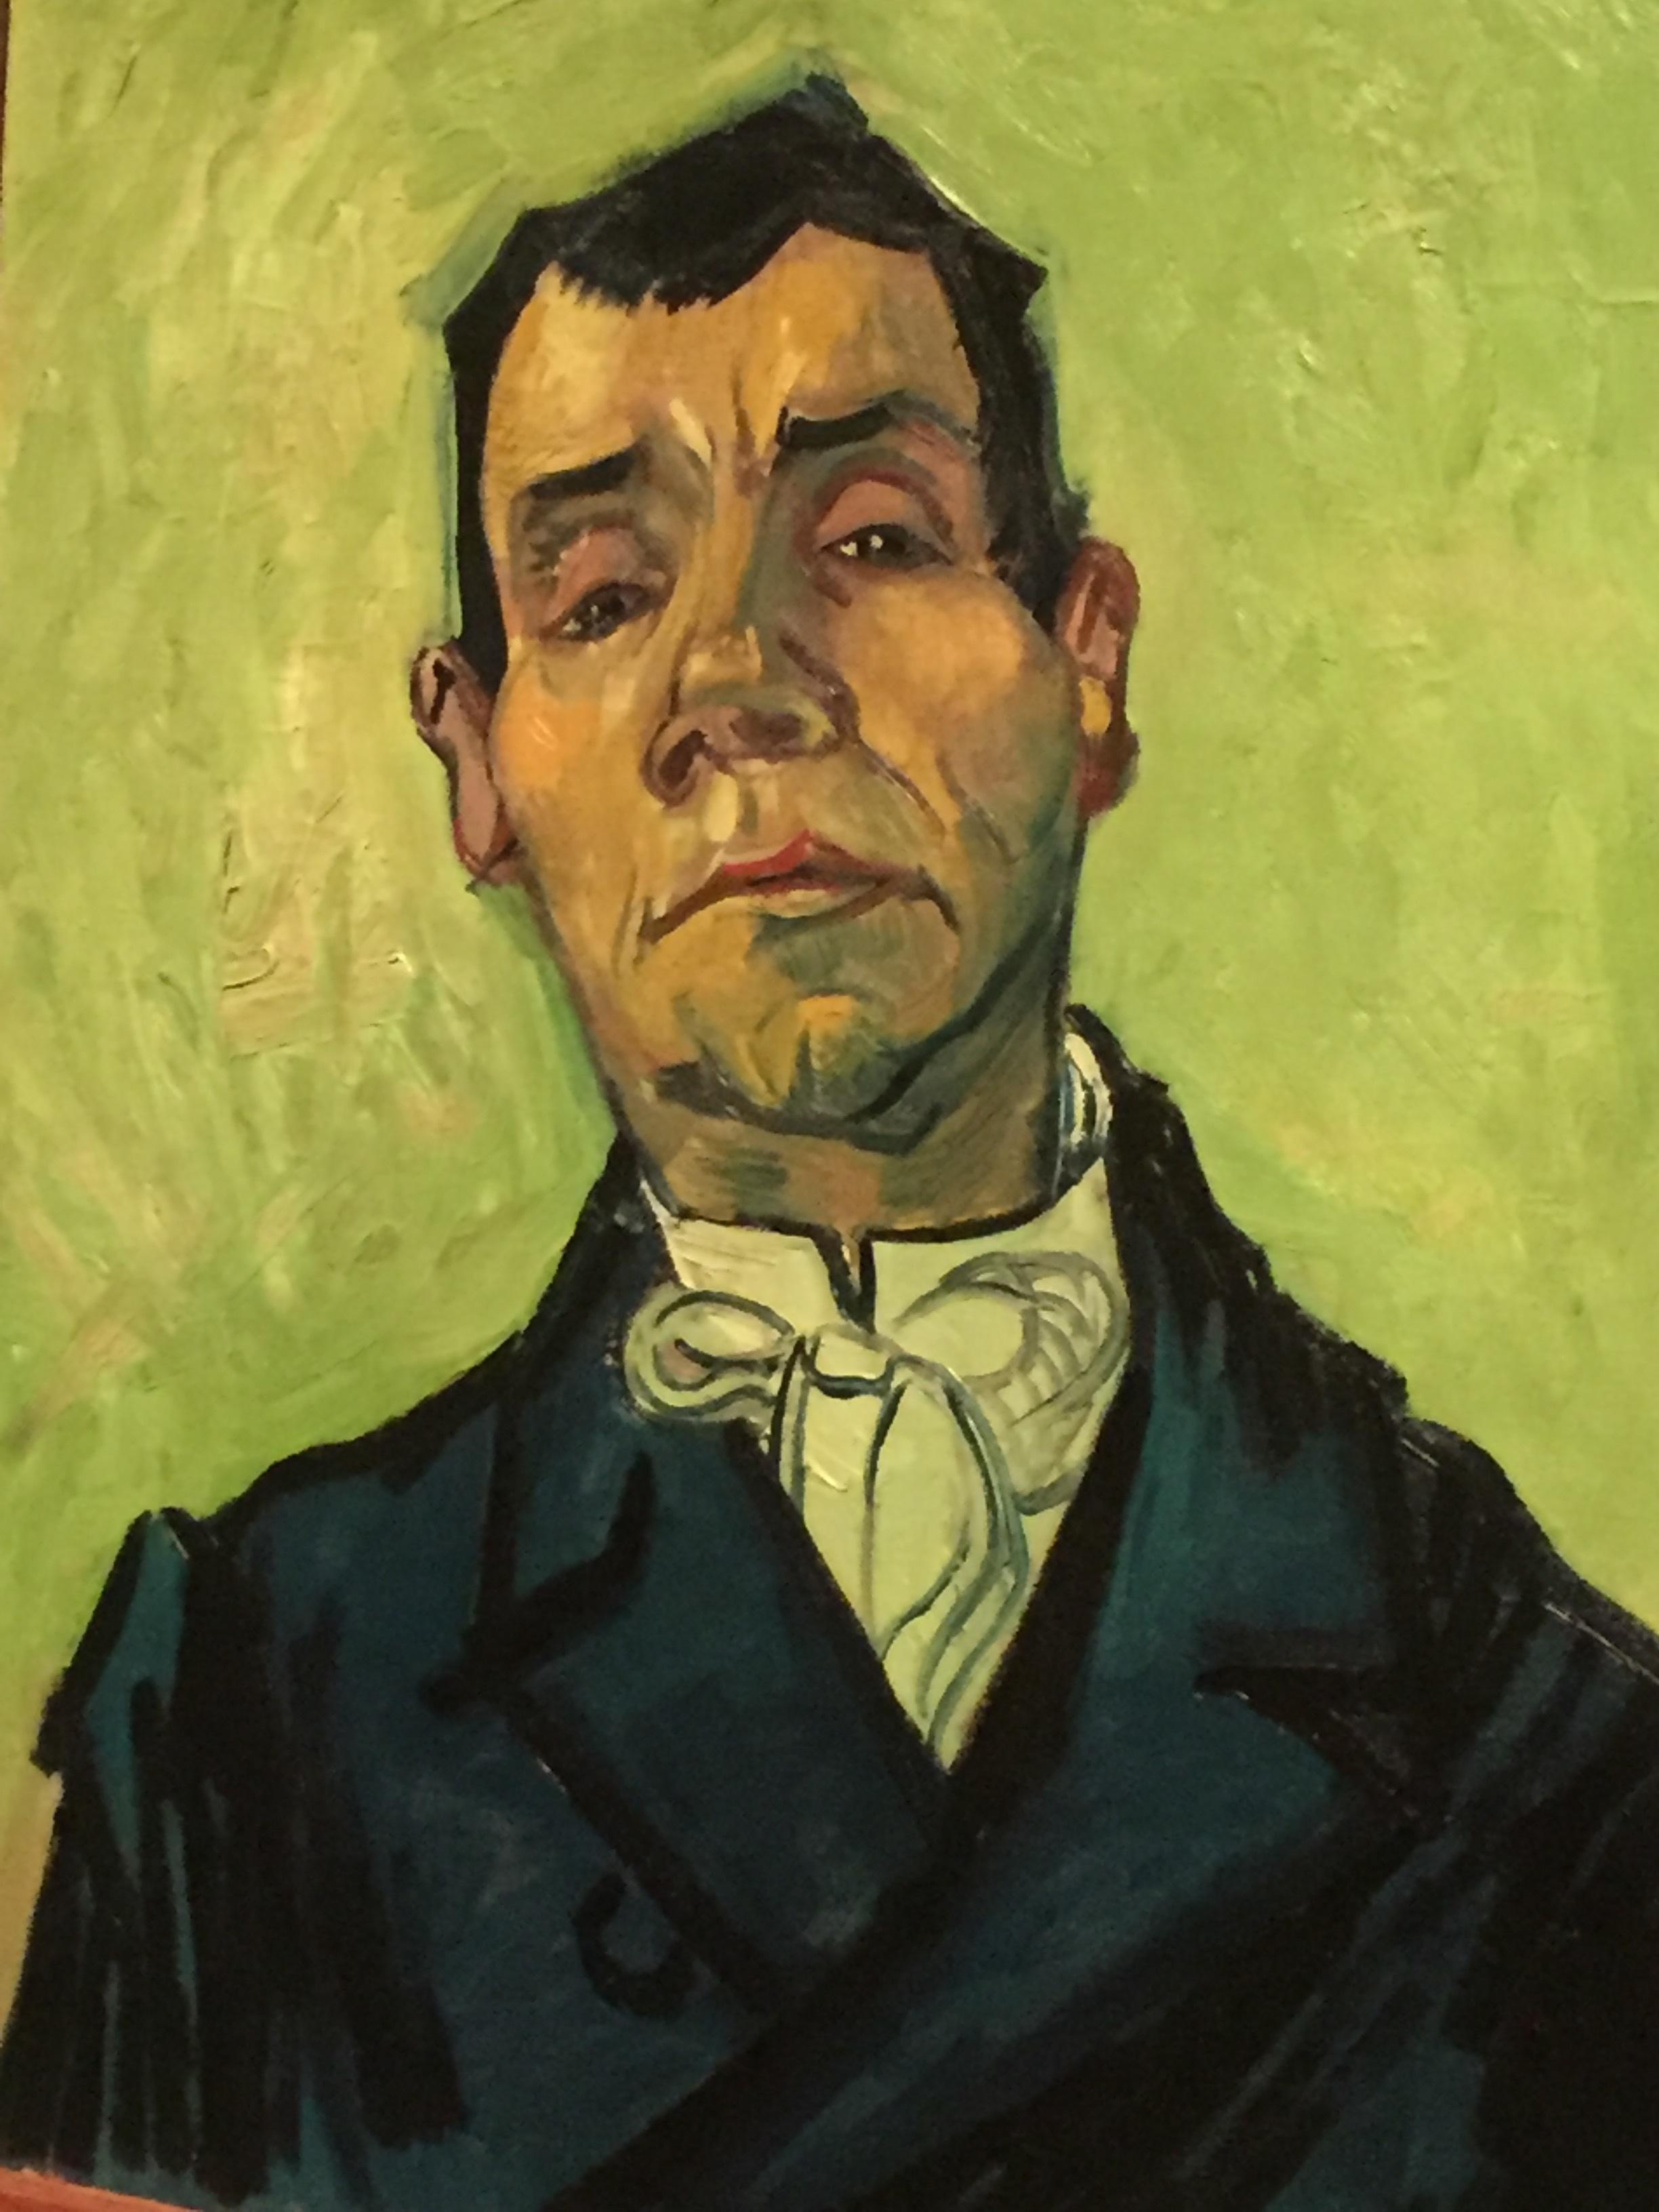 van gogh green portrait.JPG